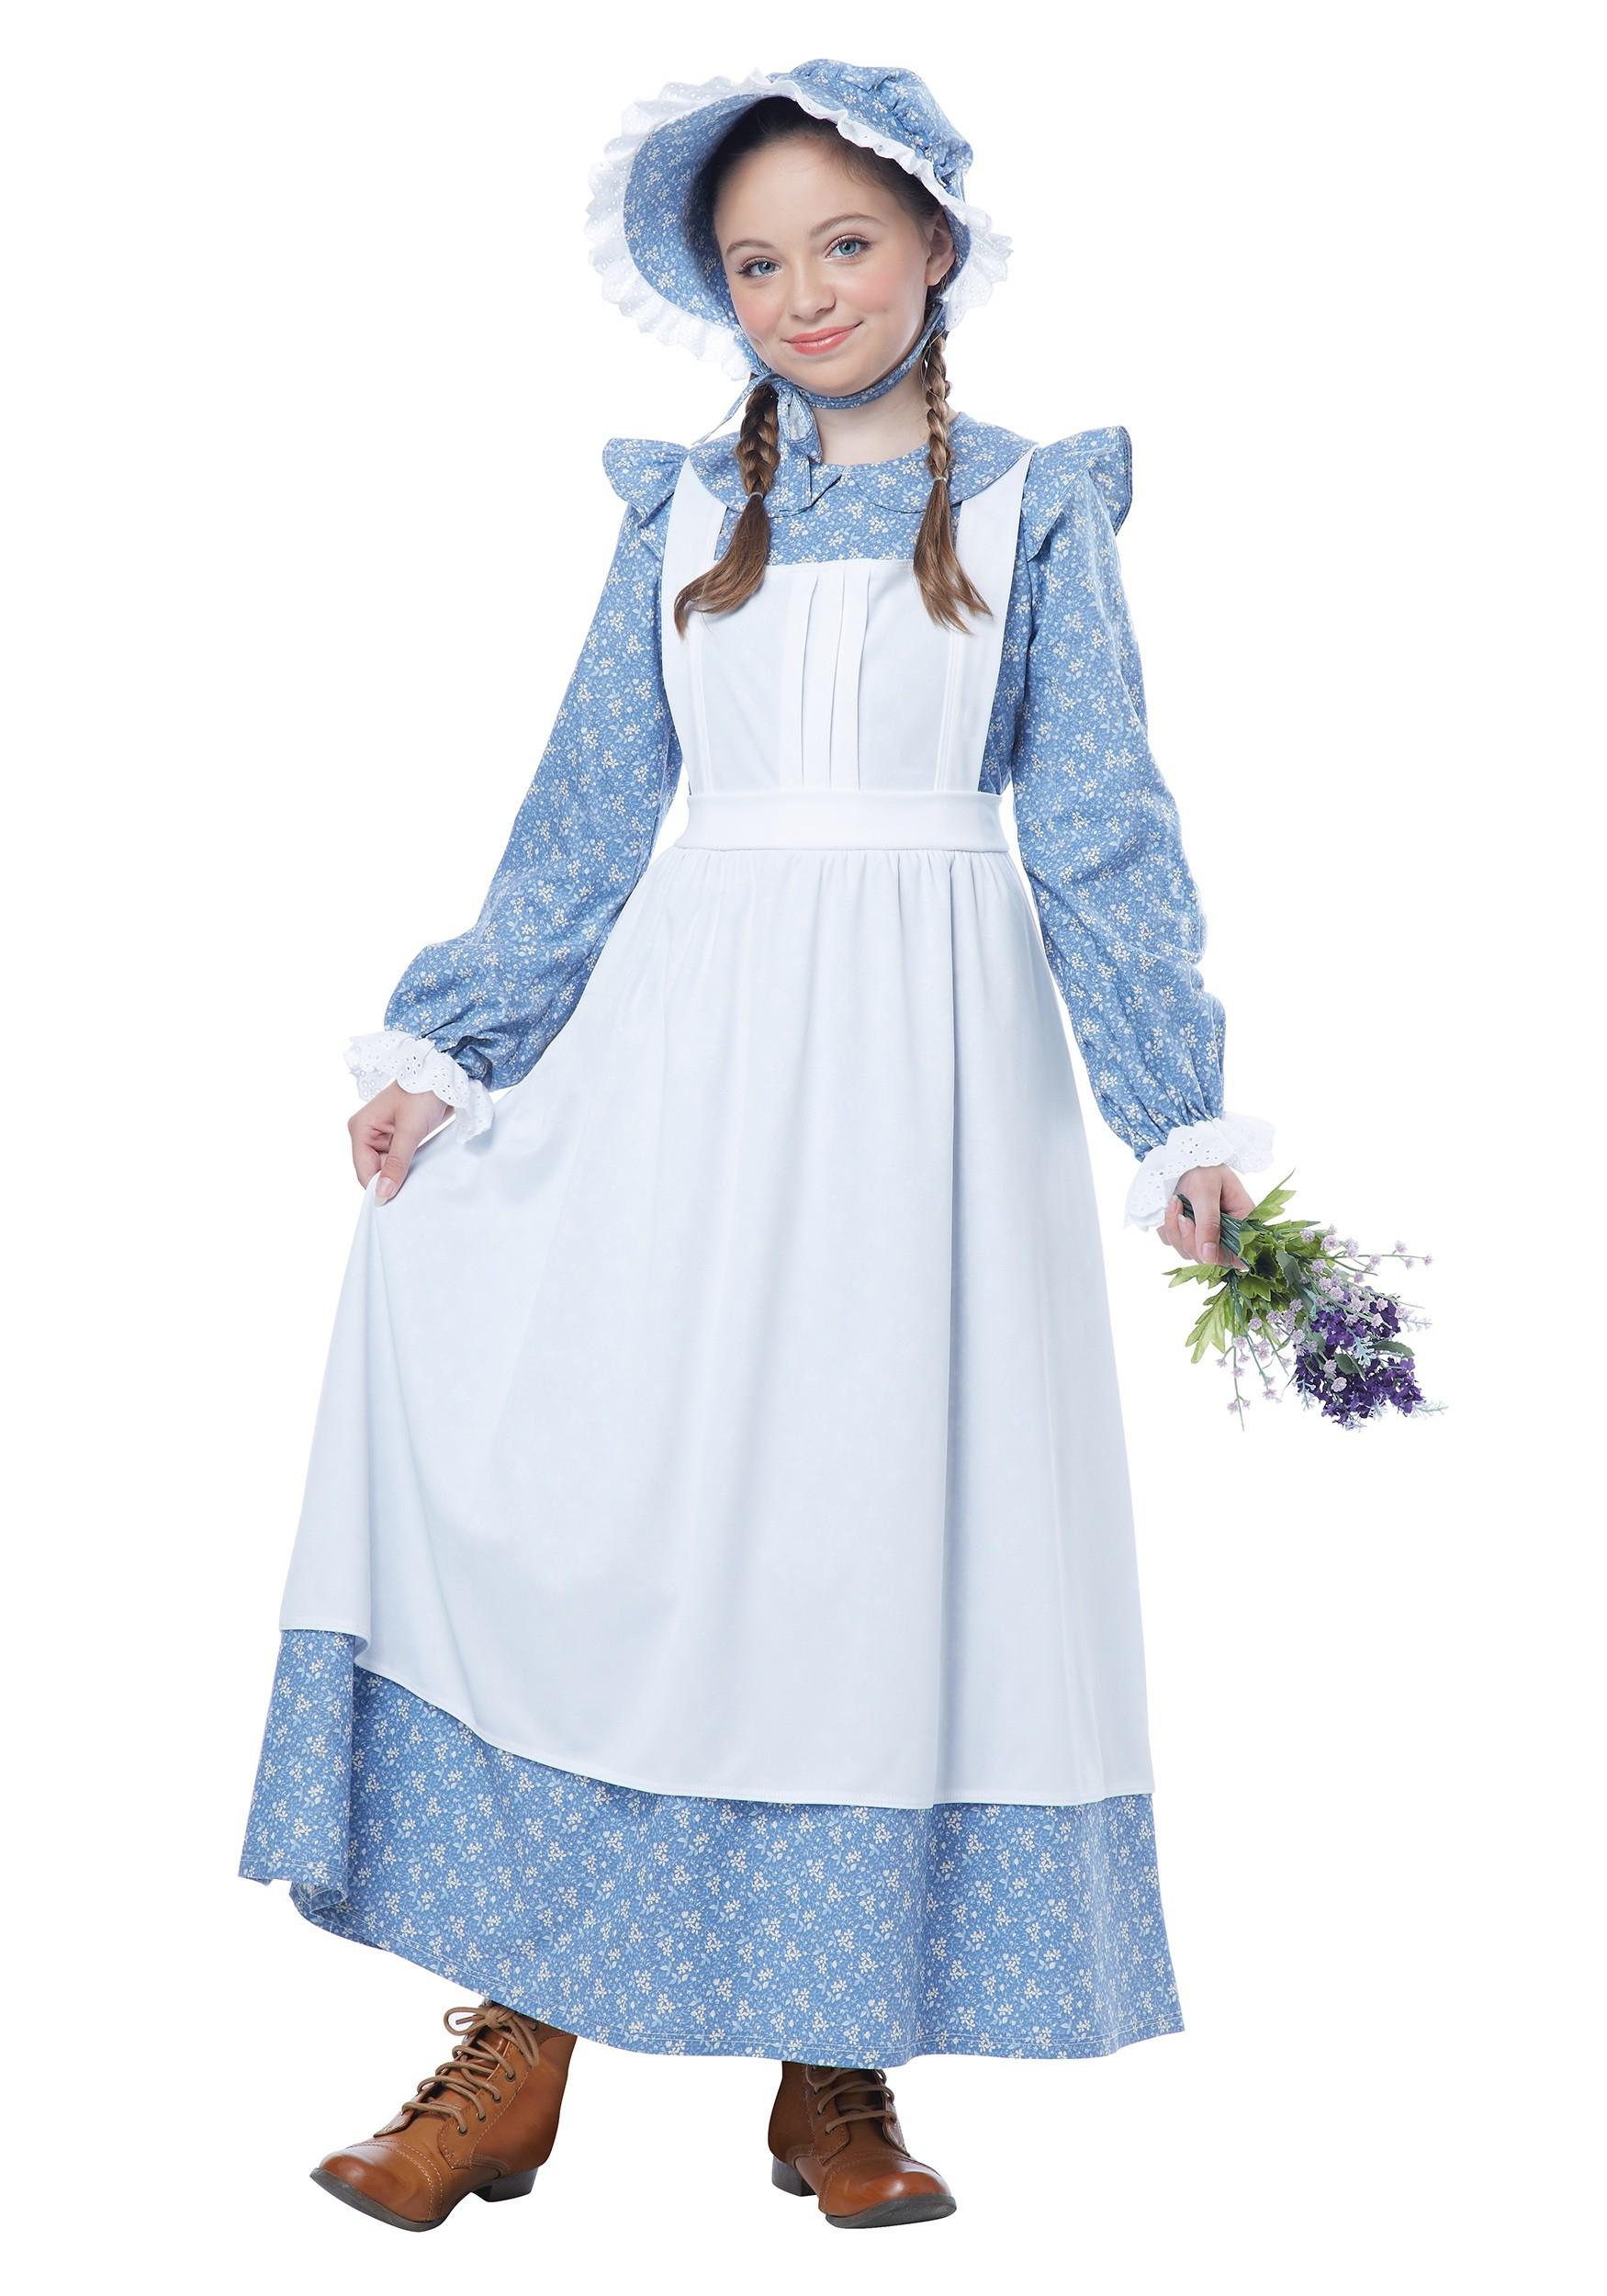 Pioneer Girl Costume for Kids | Historical Costume